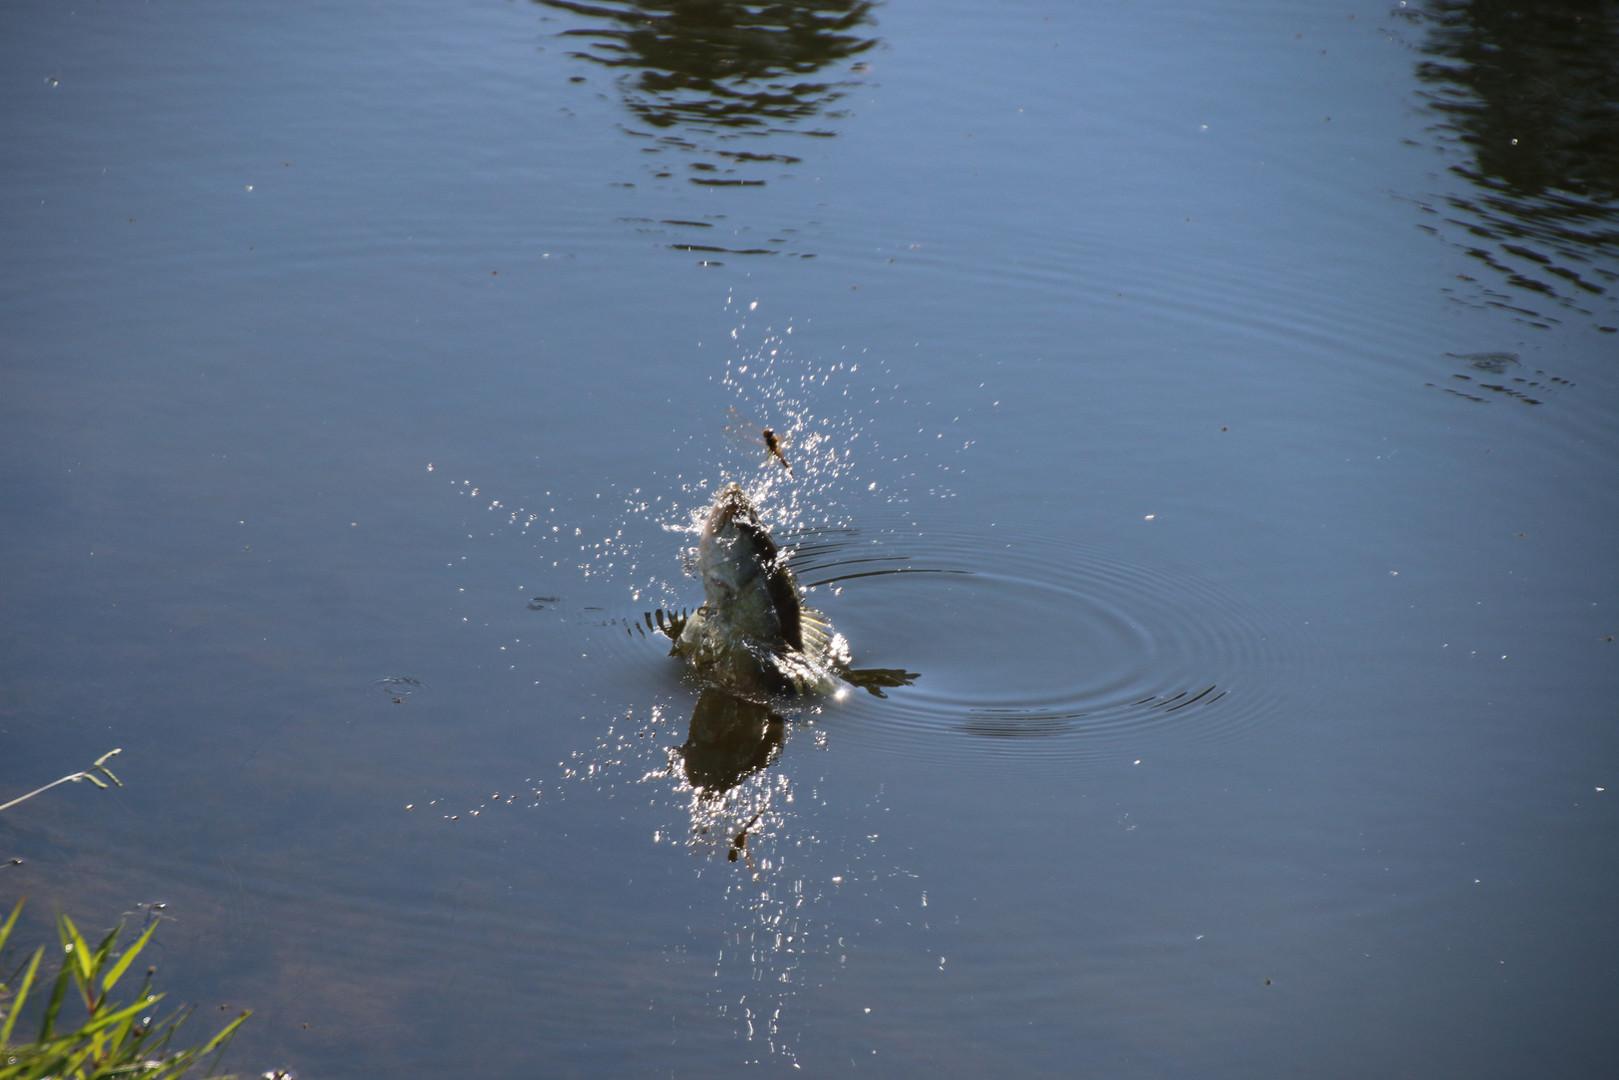 Bass misses dragon fly upper pond 2017